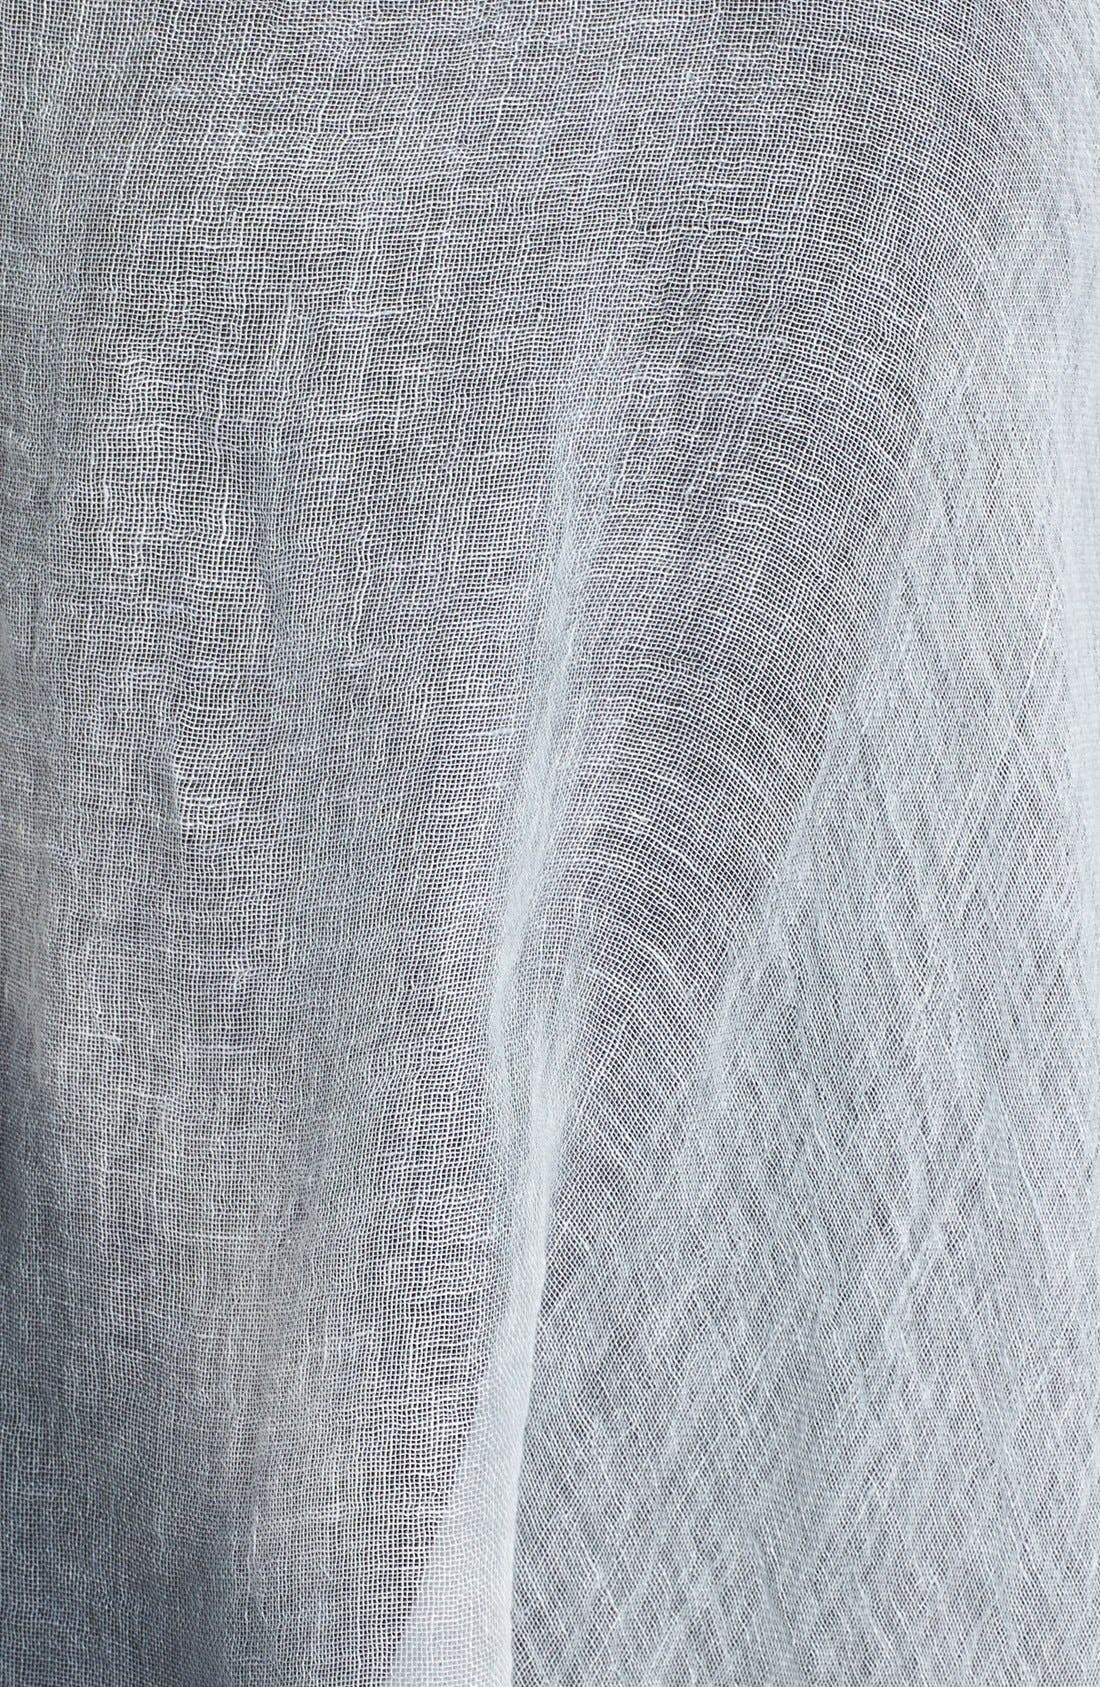 Alternate Image 2  - Eileen Fisher Linen Scarf